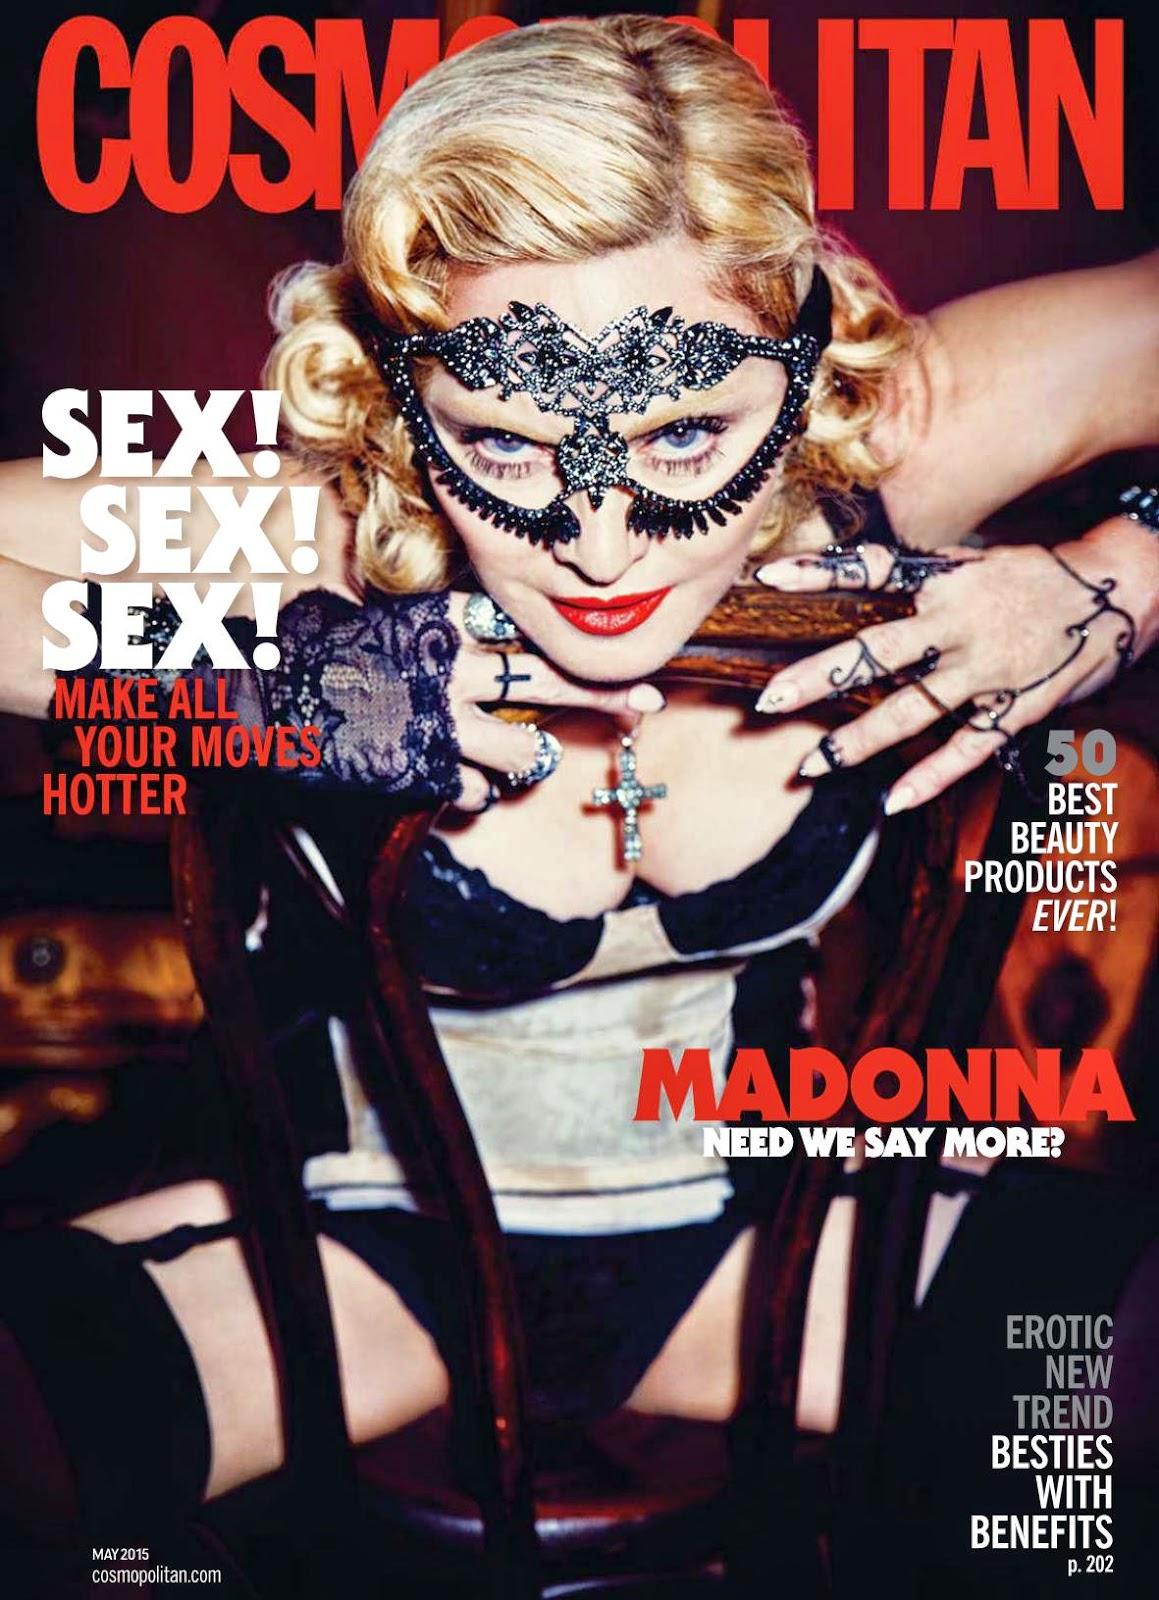 Singer, Actress @ Madonna - Cosmopolitan USA, May 2015